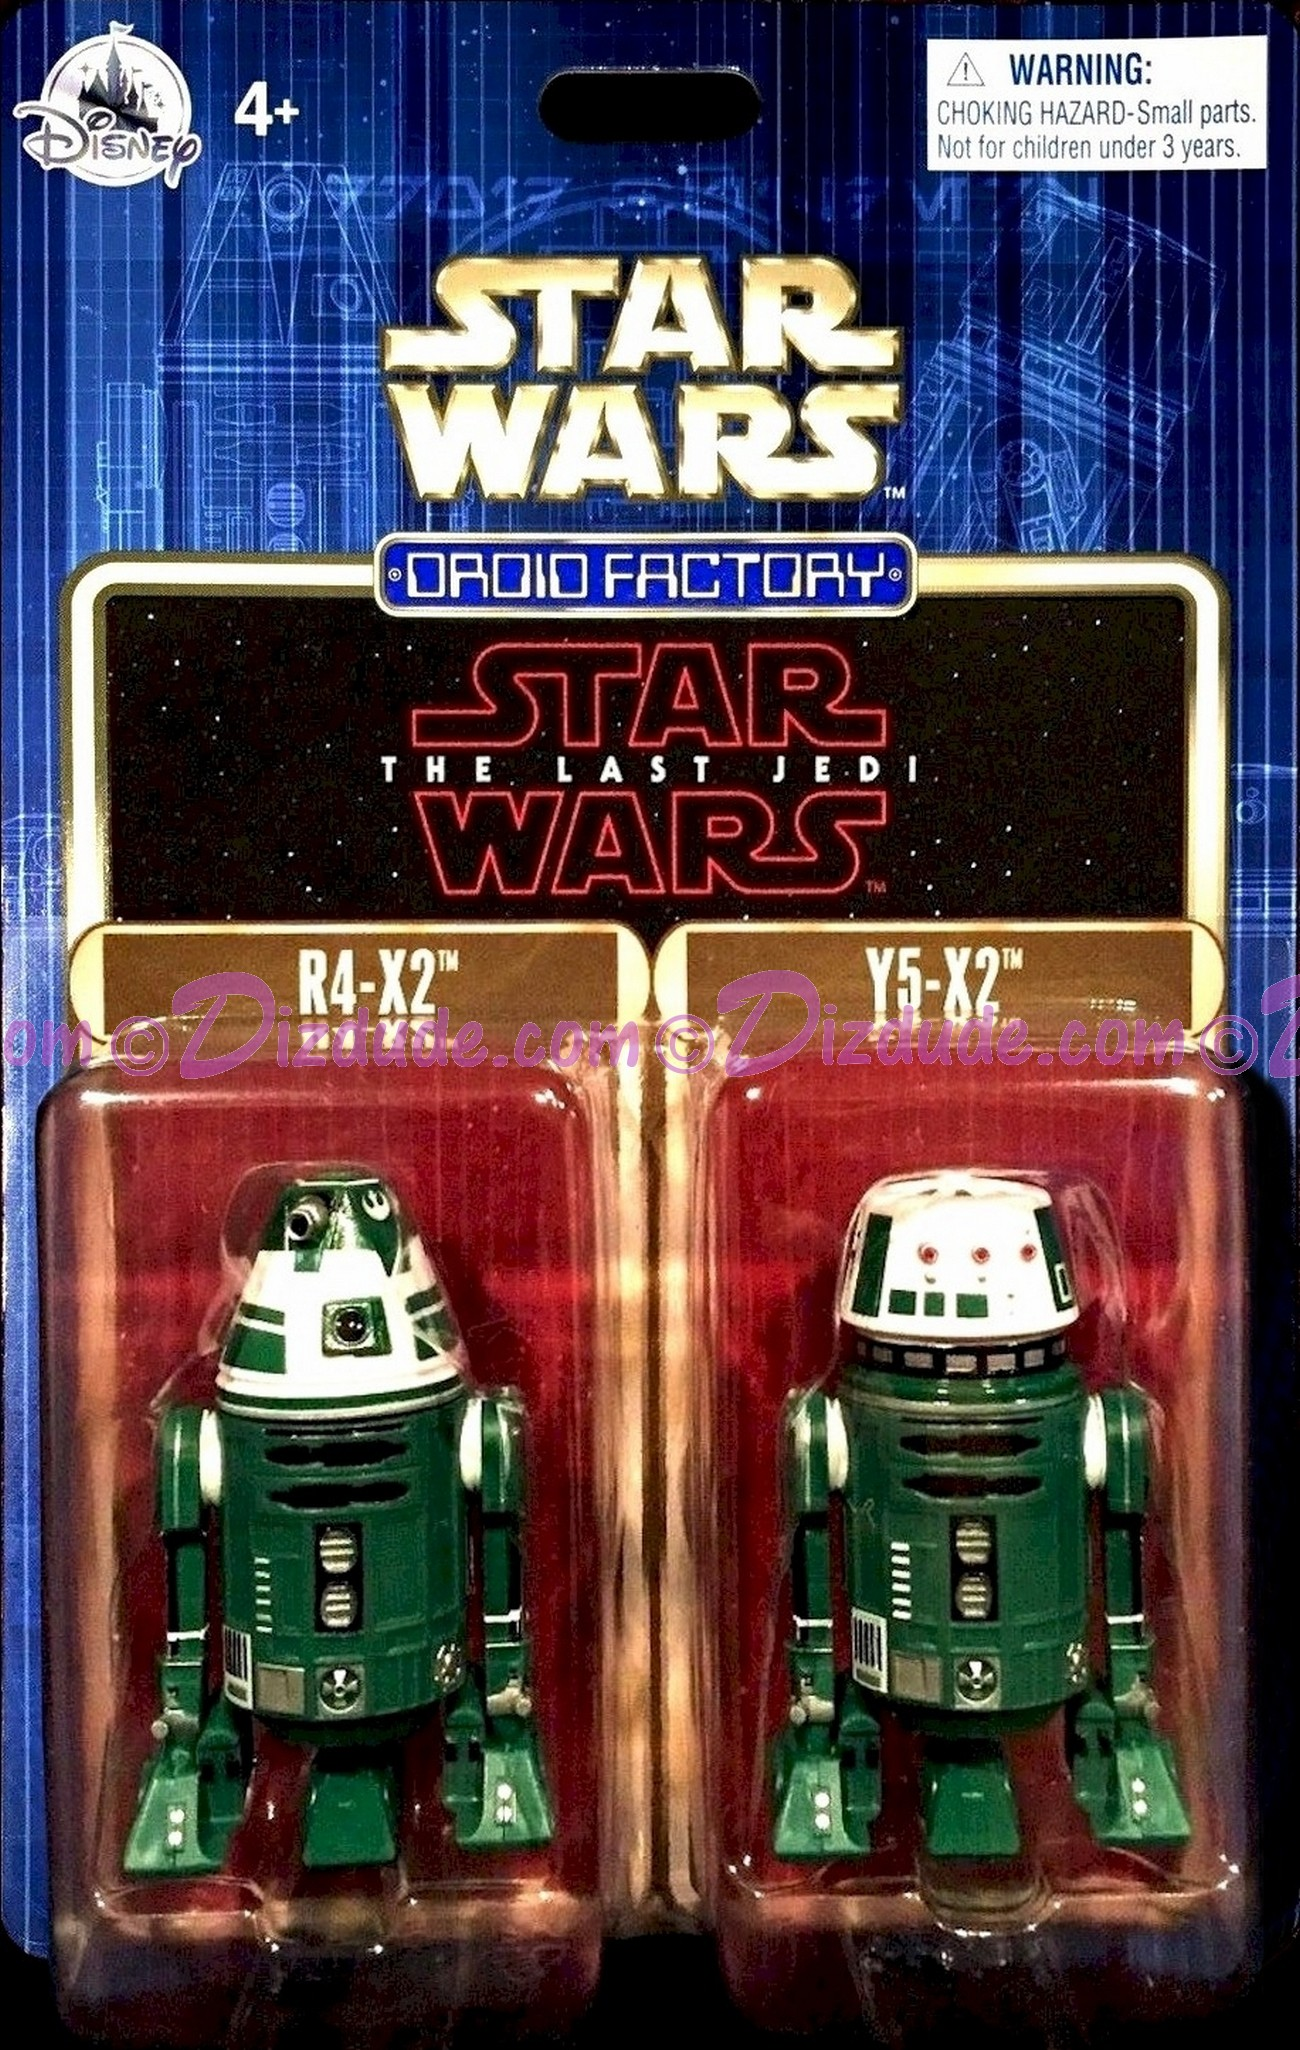 Star Wars The Last Jedi Twin Pack  R4-X2 & Y5-X2 Astromech Droids - Disney World DROID FACTORY Action Figures 3¾ Inch - Limited Release © Dizdude.com